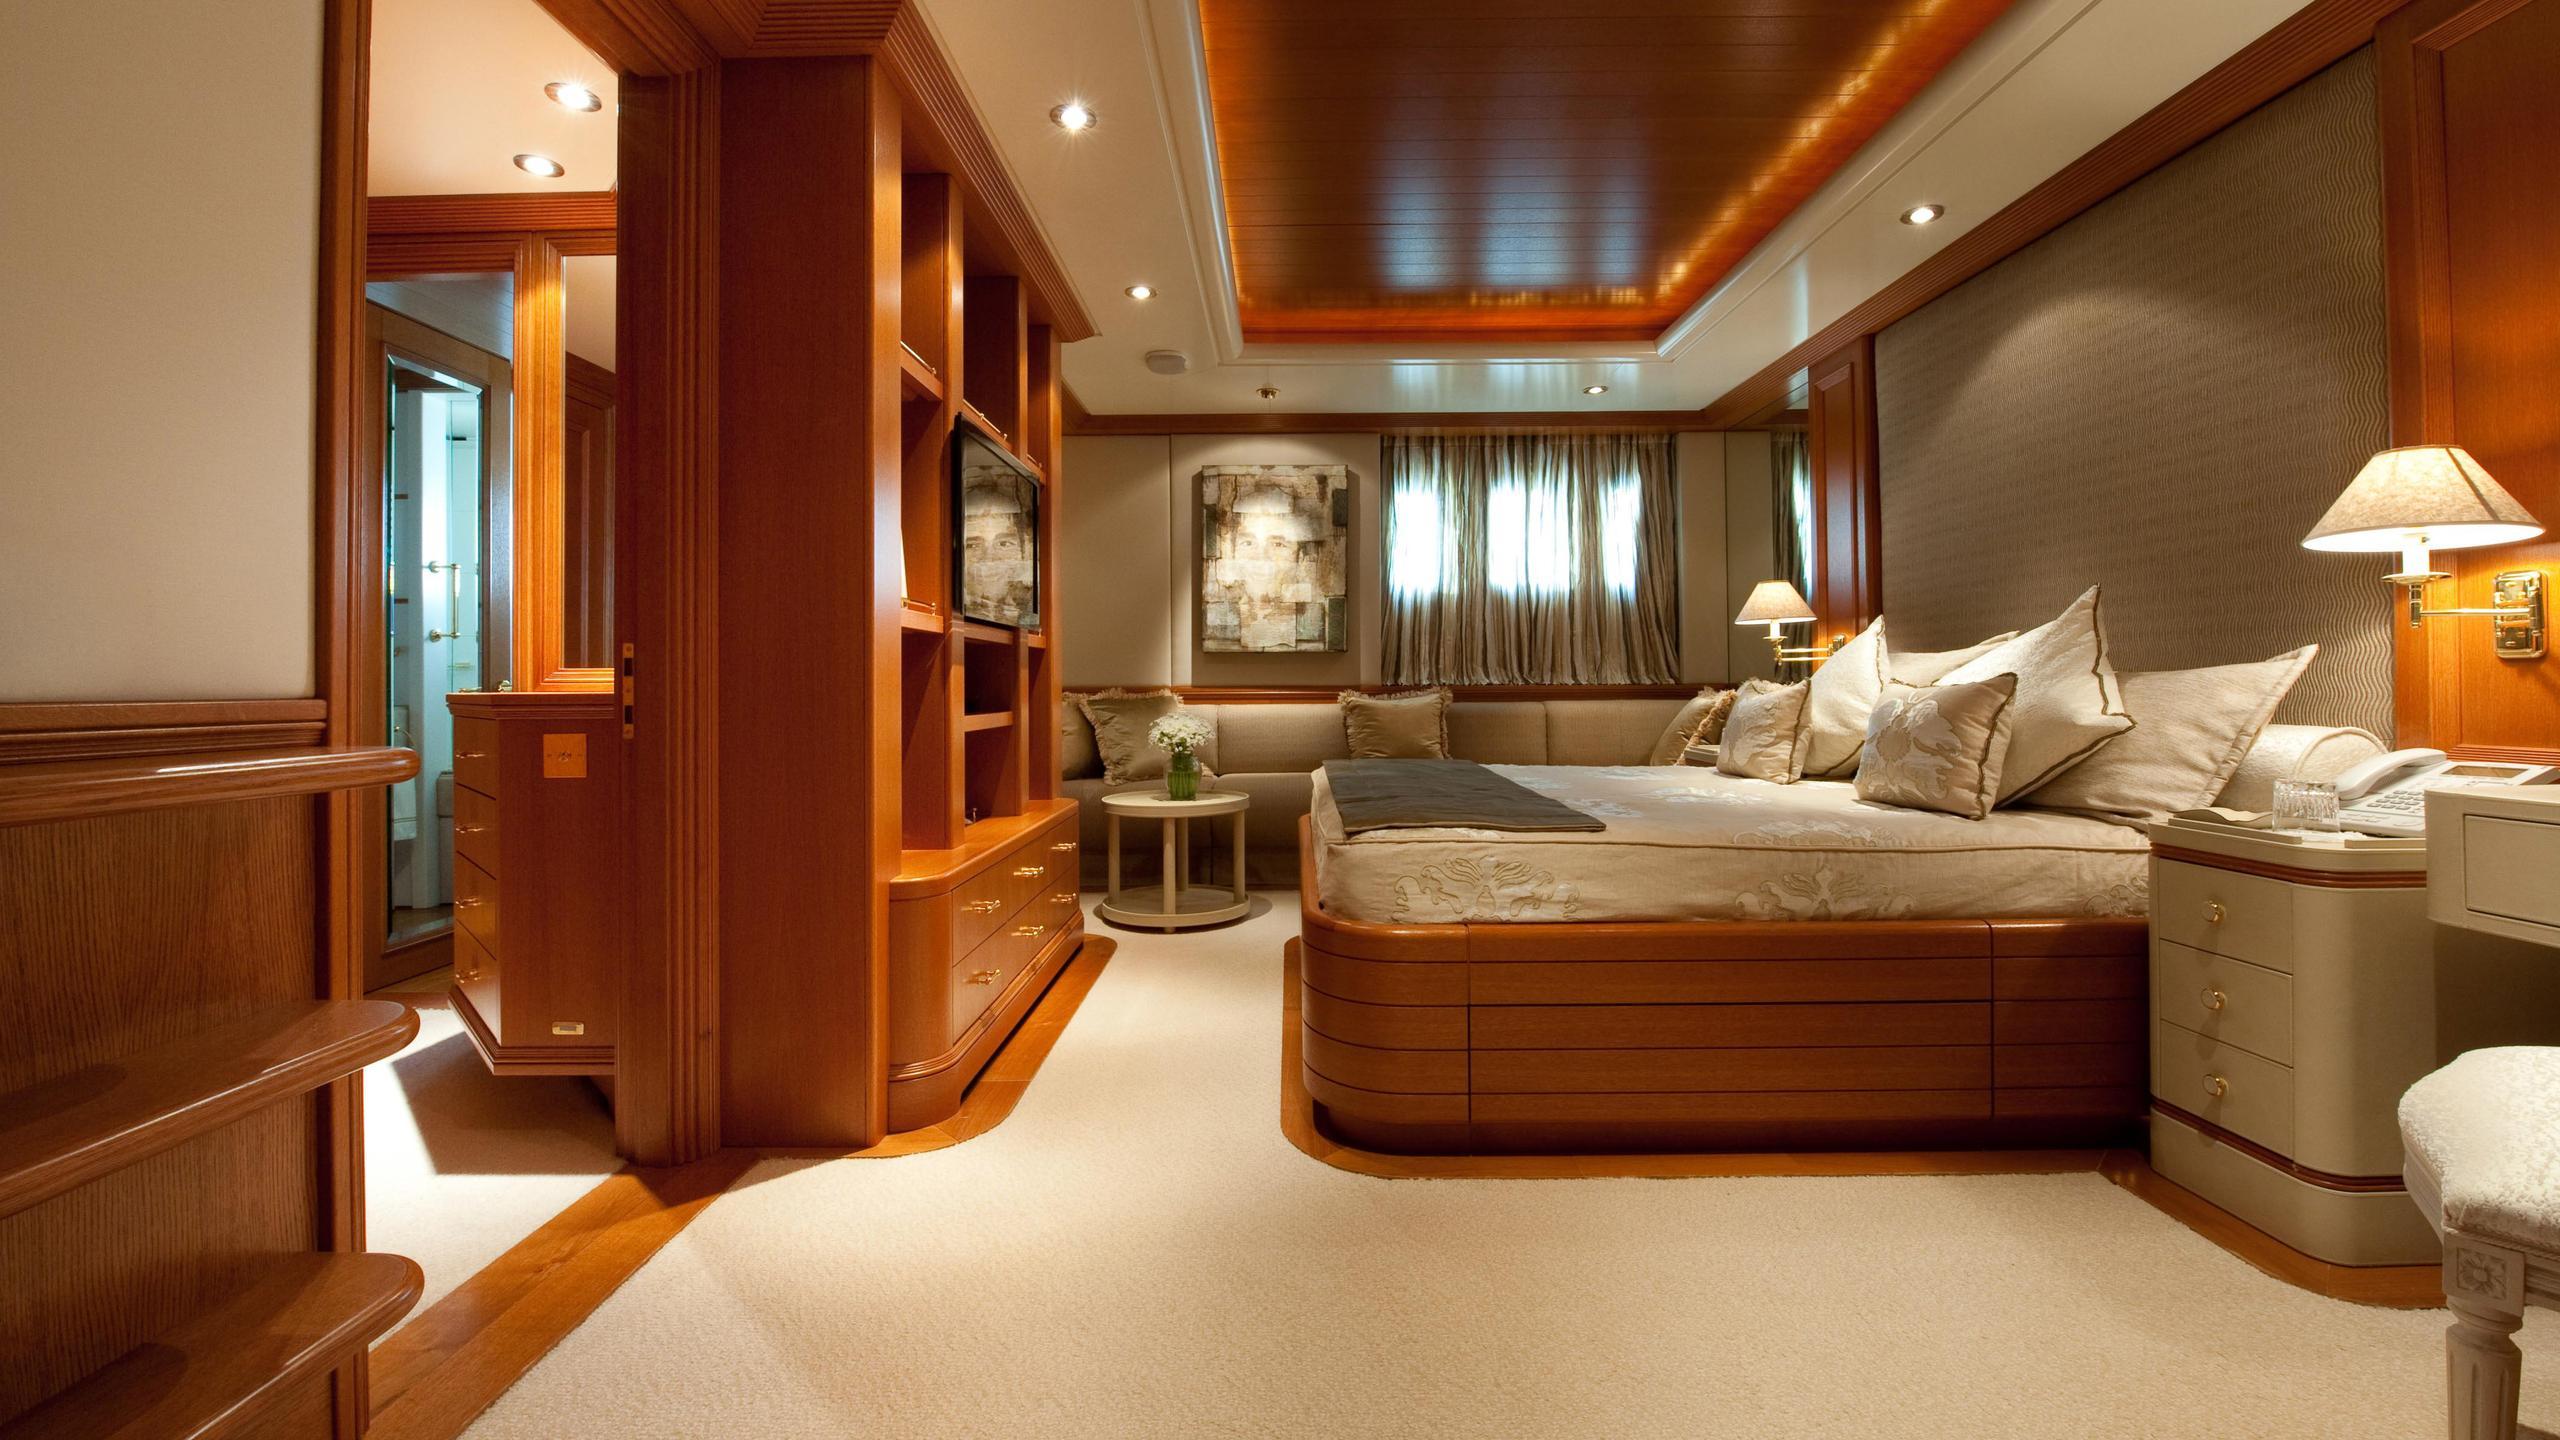 reborn-motor-yacht-amels-1999-75m-double-cabin